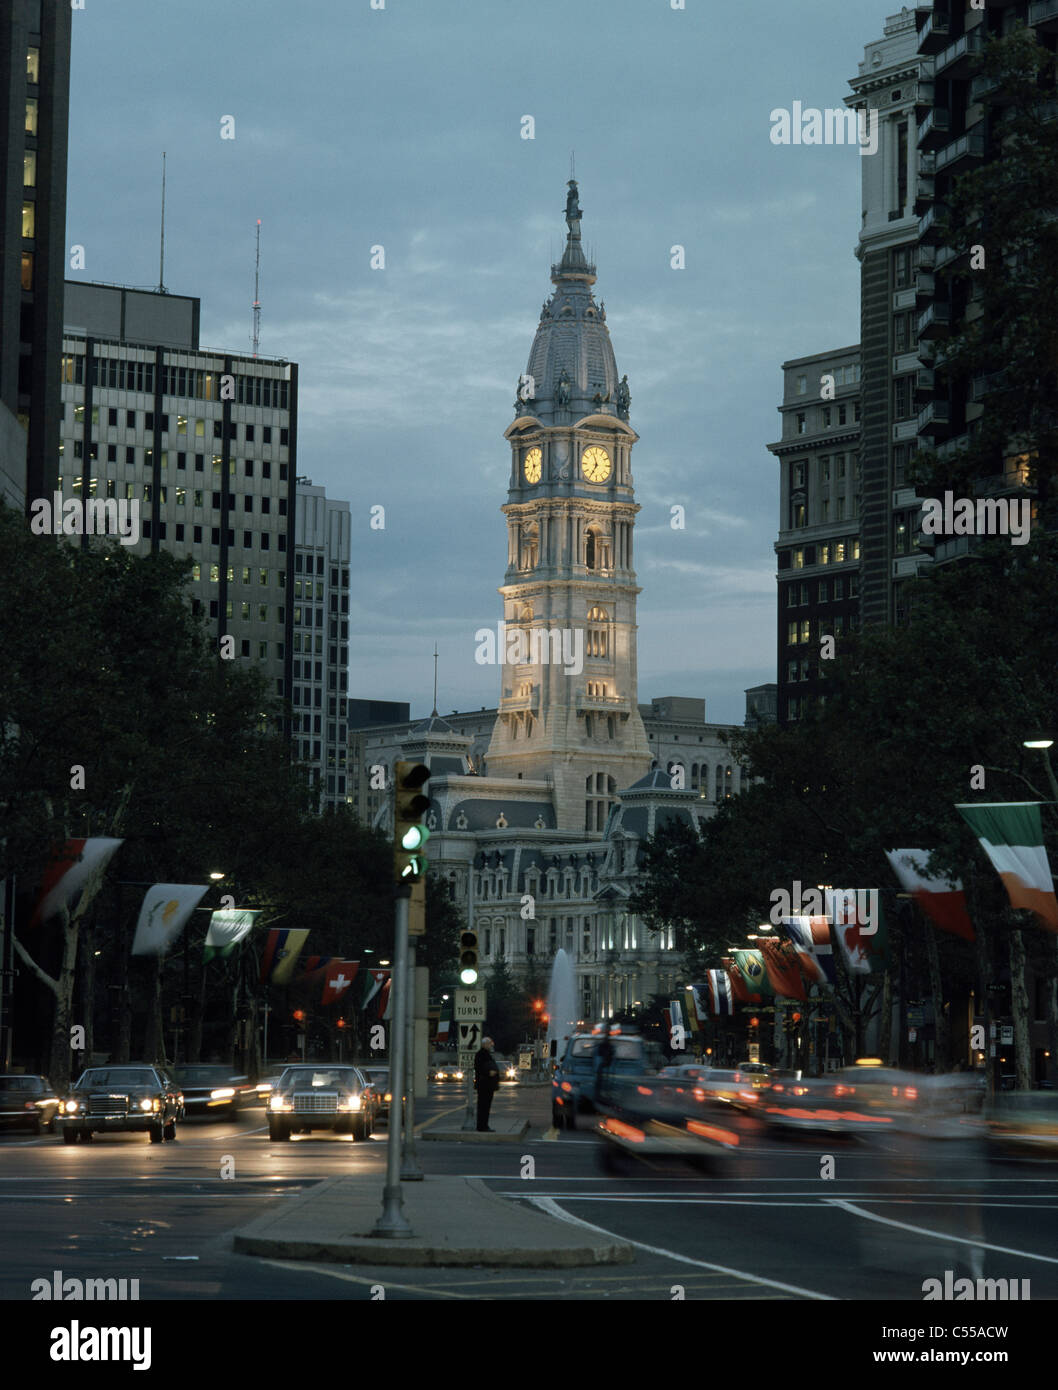 USA, Pennsylvania, Philadelphia, Benjamin Franklin Parkway and City Hall at dusk Stock Photo